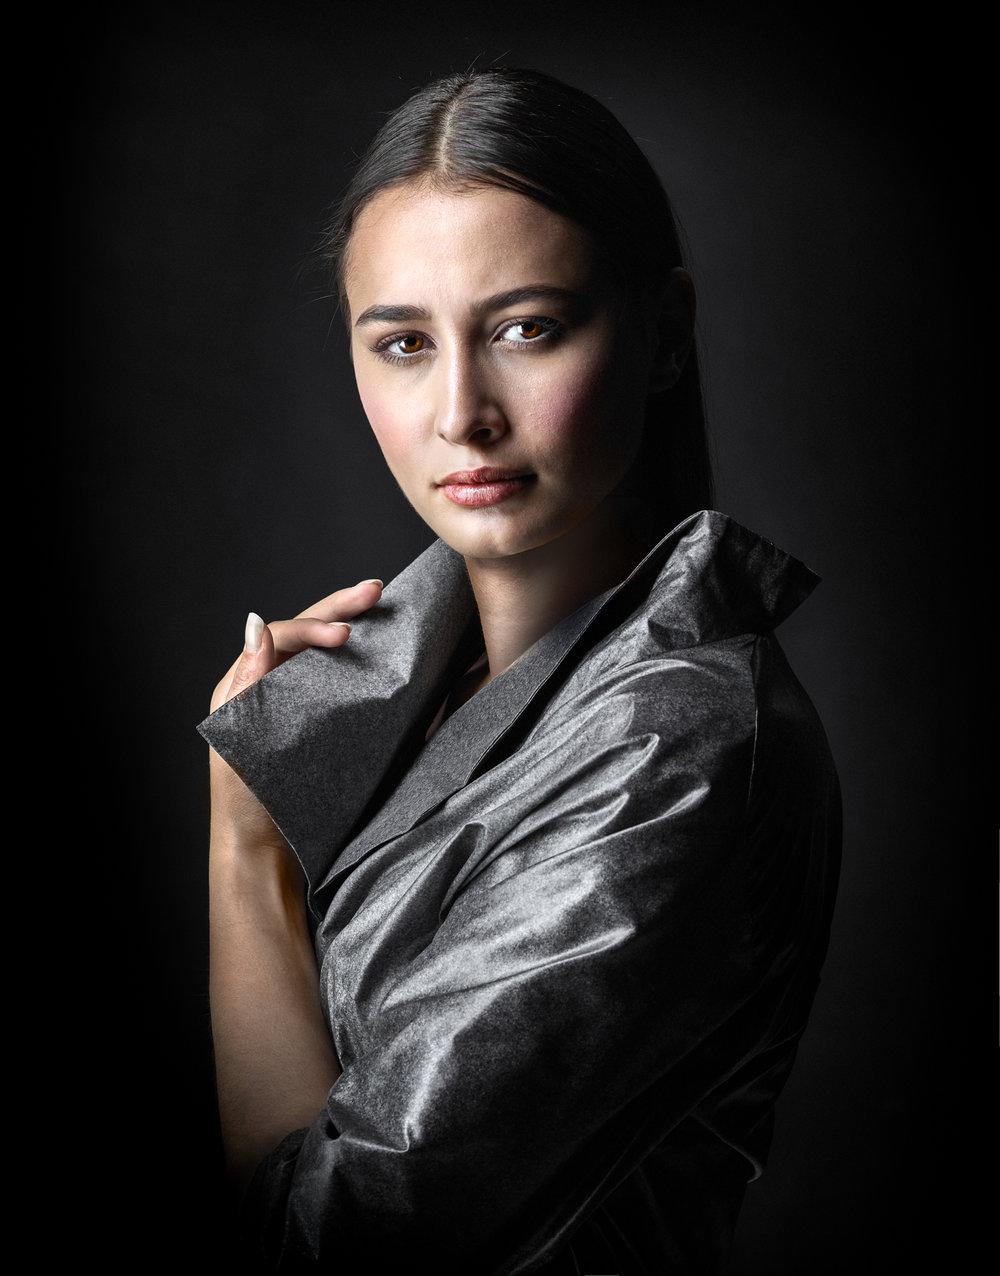 Studio Portrait Fotografie, Kim, time models, Studioportrait, Peoplefotografie, Portraitfotografie